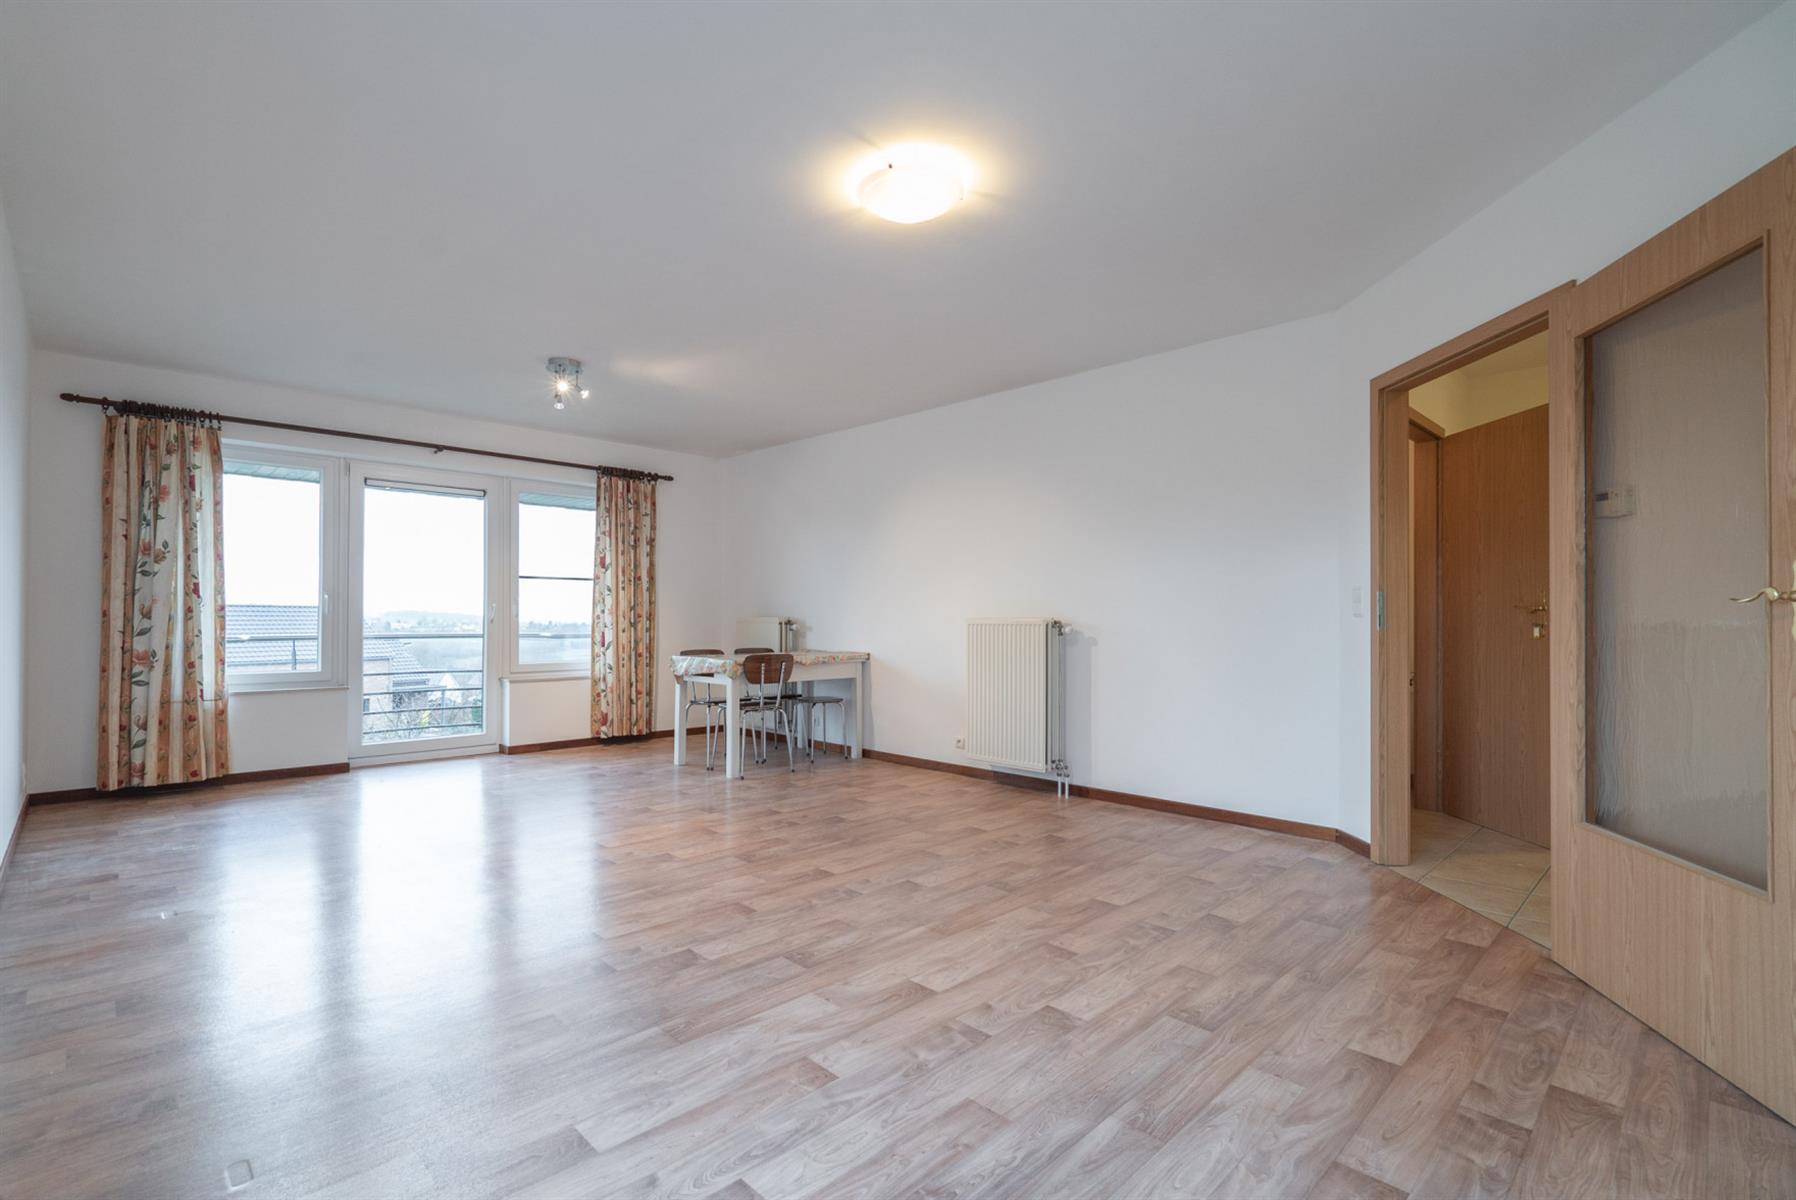 Appartement - Jalhay - #4305578-4